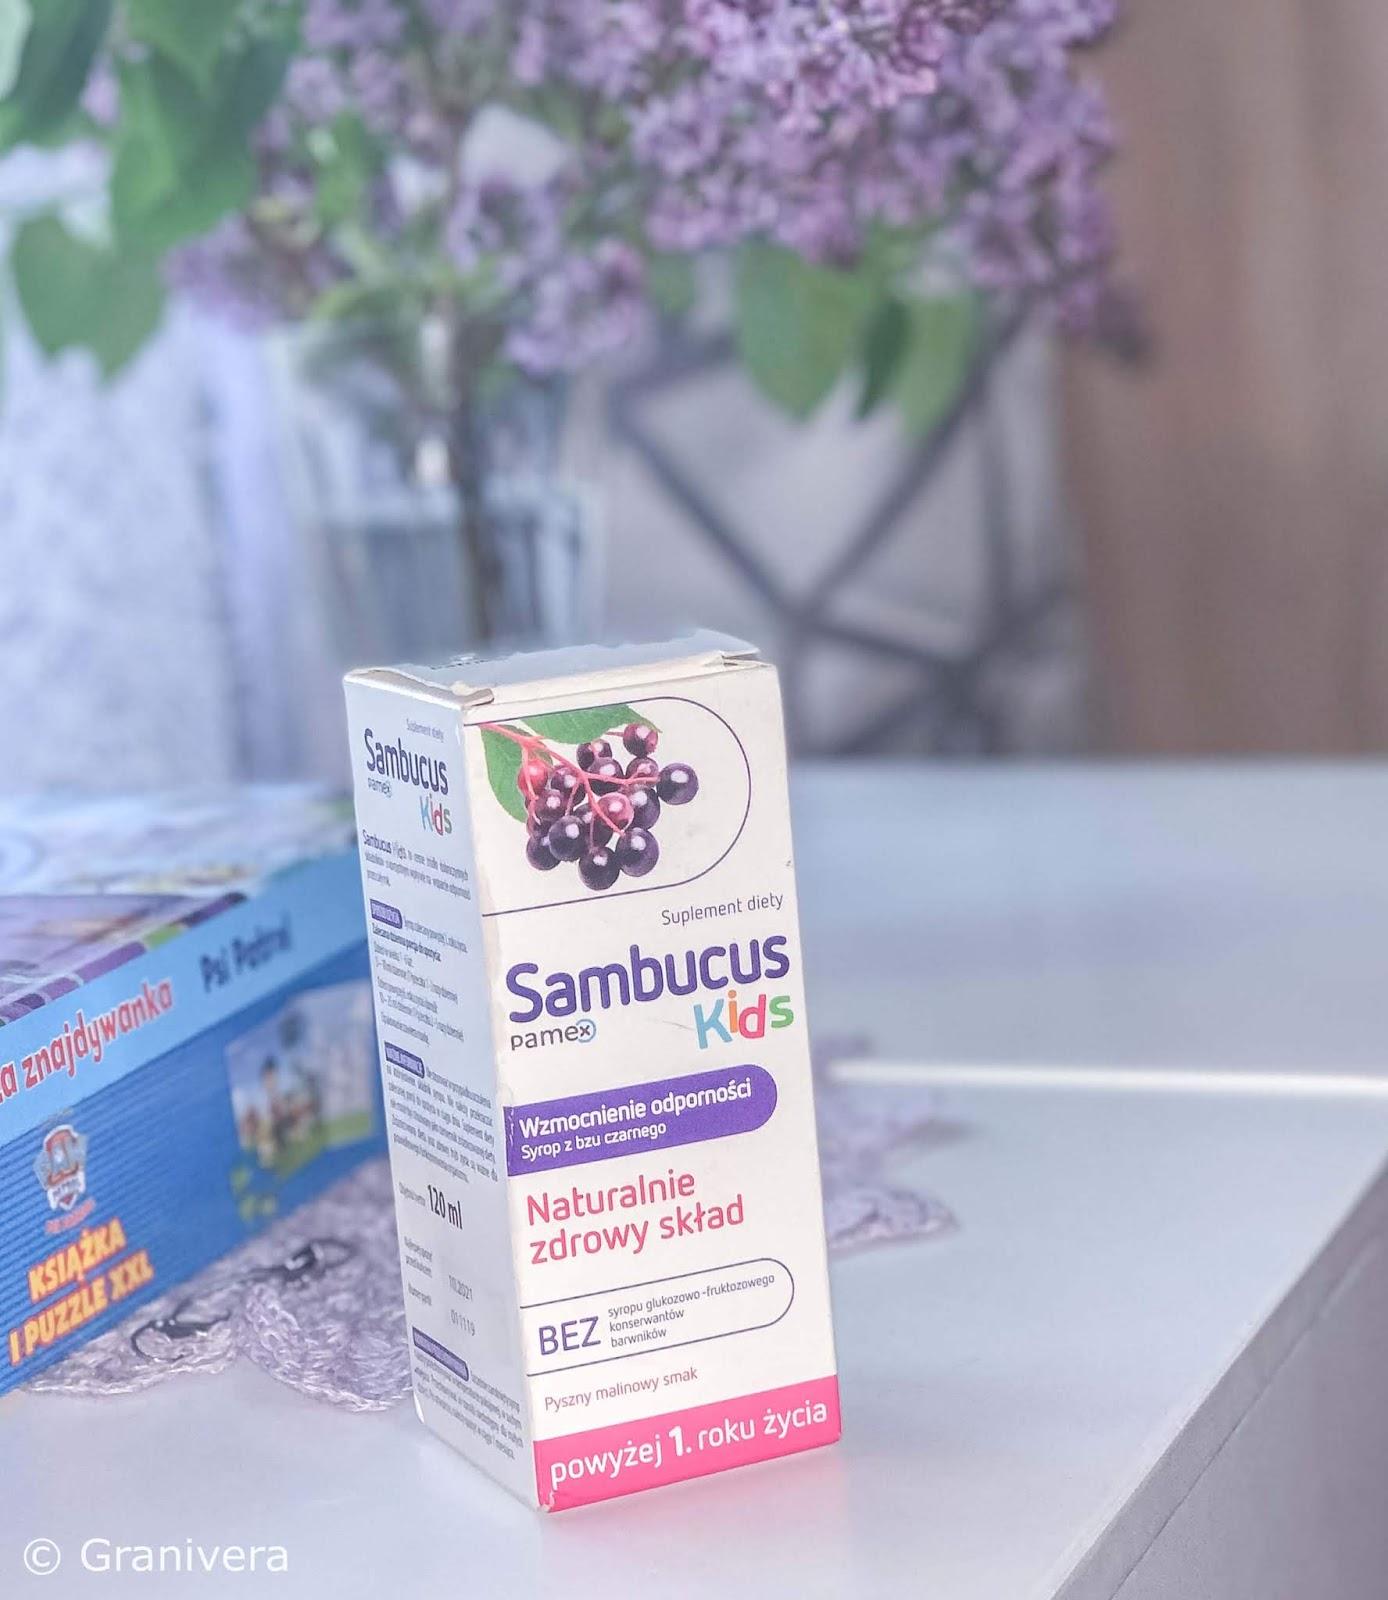 syrop-sambucus-kids